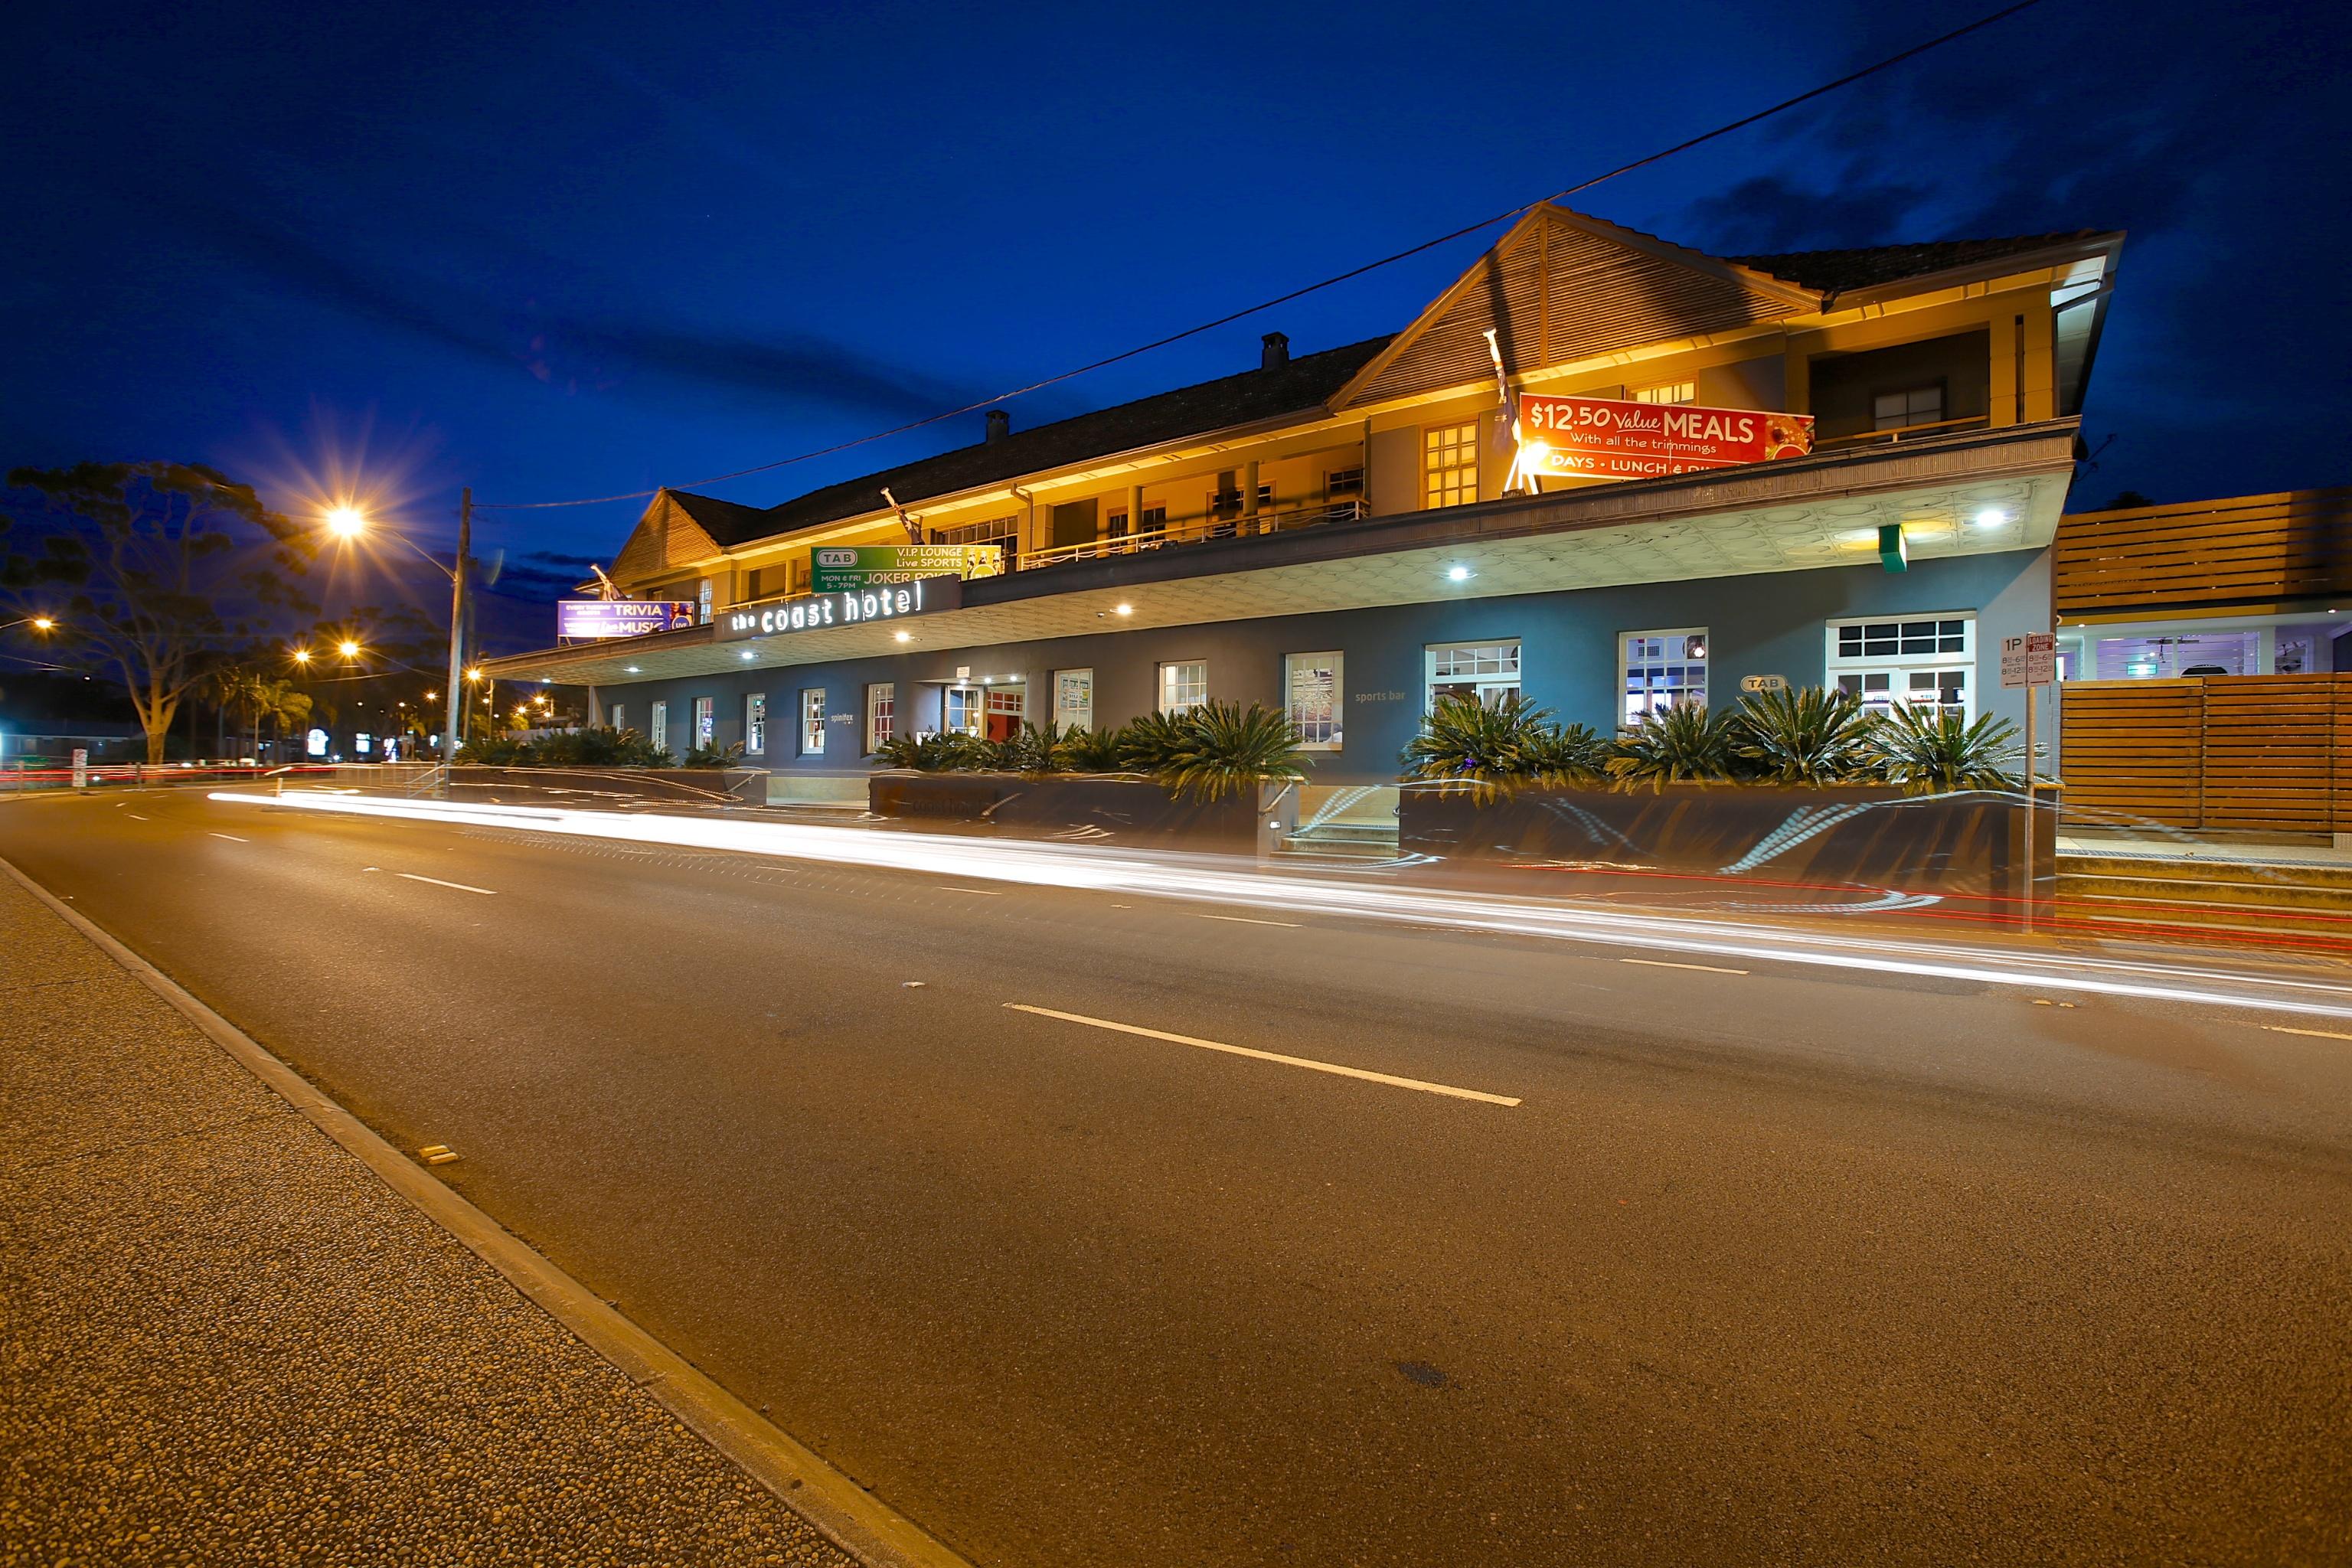 Outstanding Landmark Hotel Investment 31 Year Lease Expiring 2039